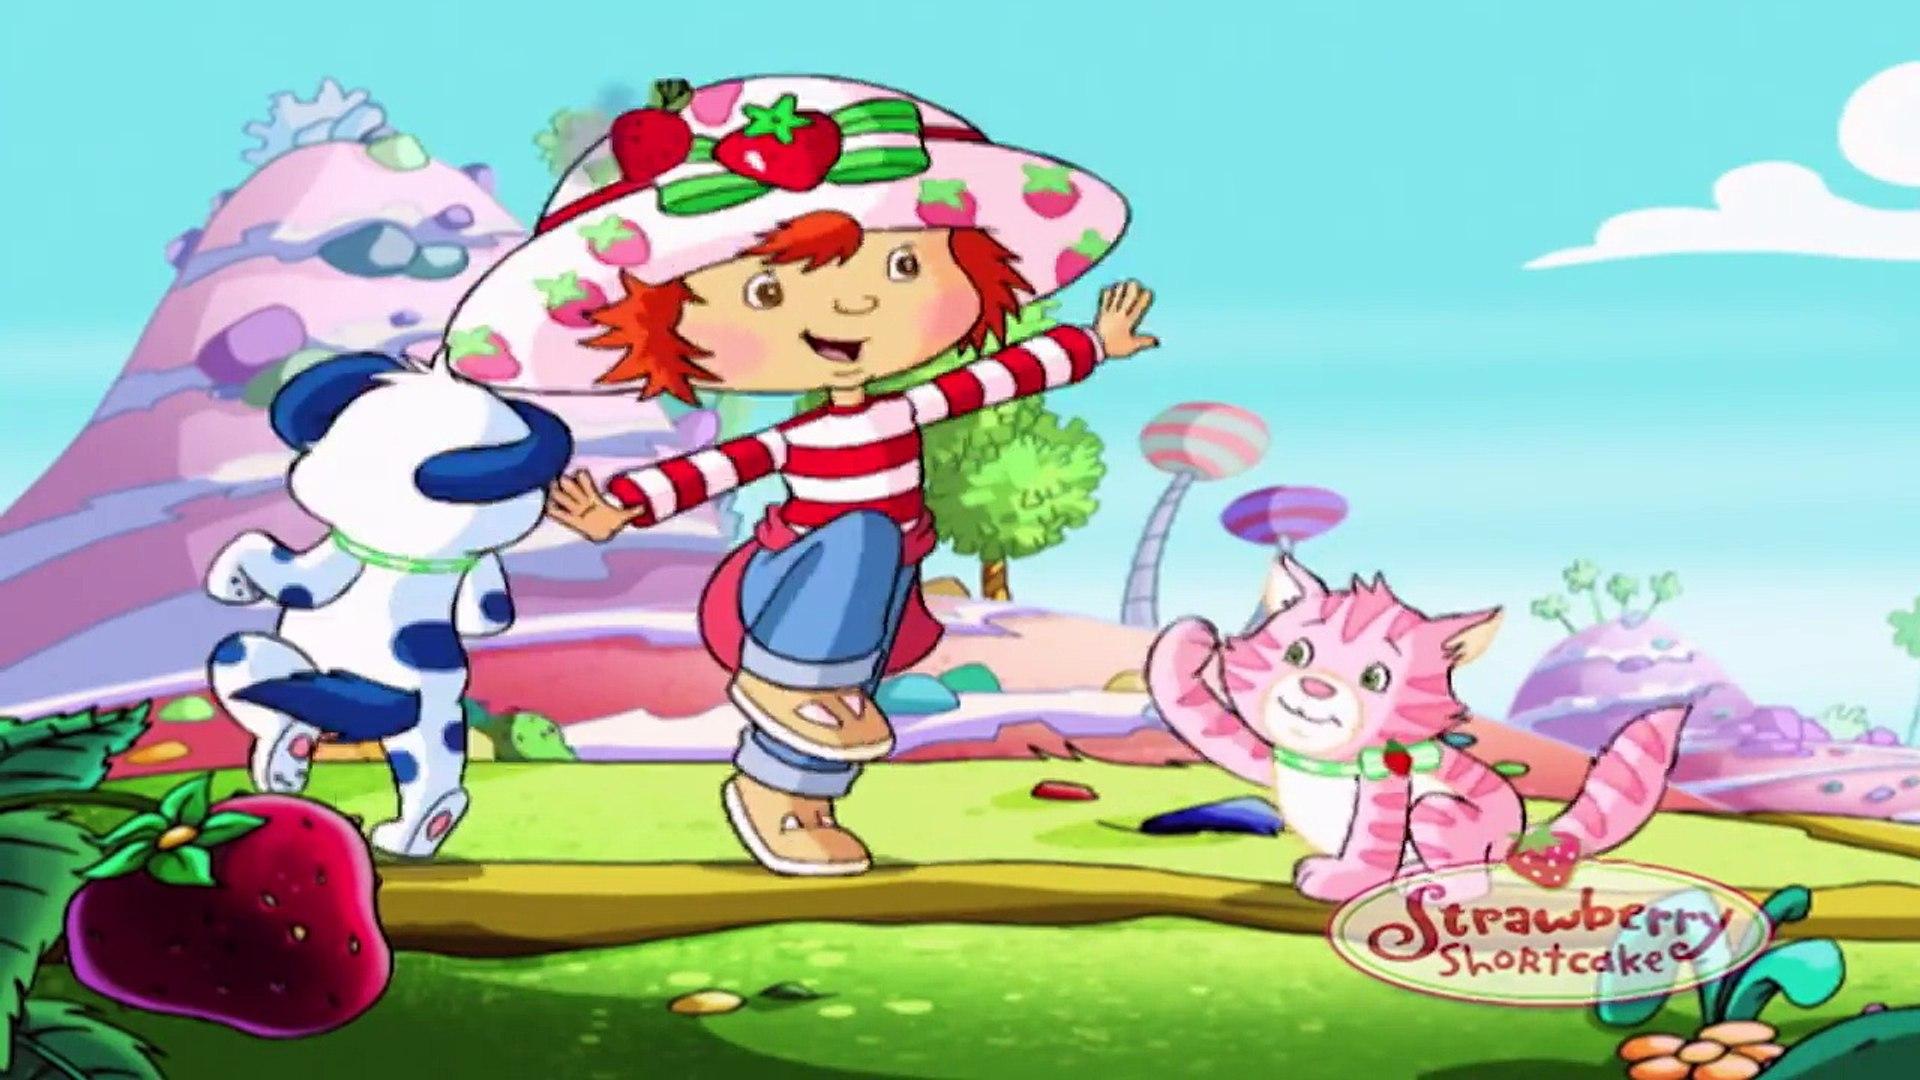 Strawberry Shortcake Full Episode Video Dailymotion